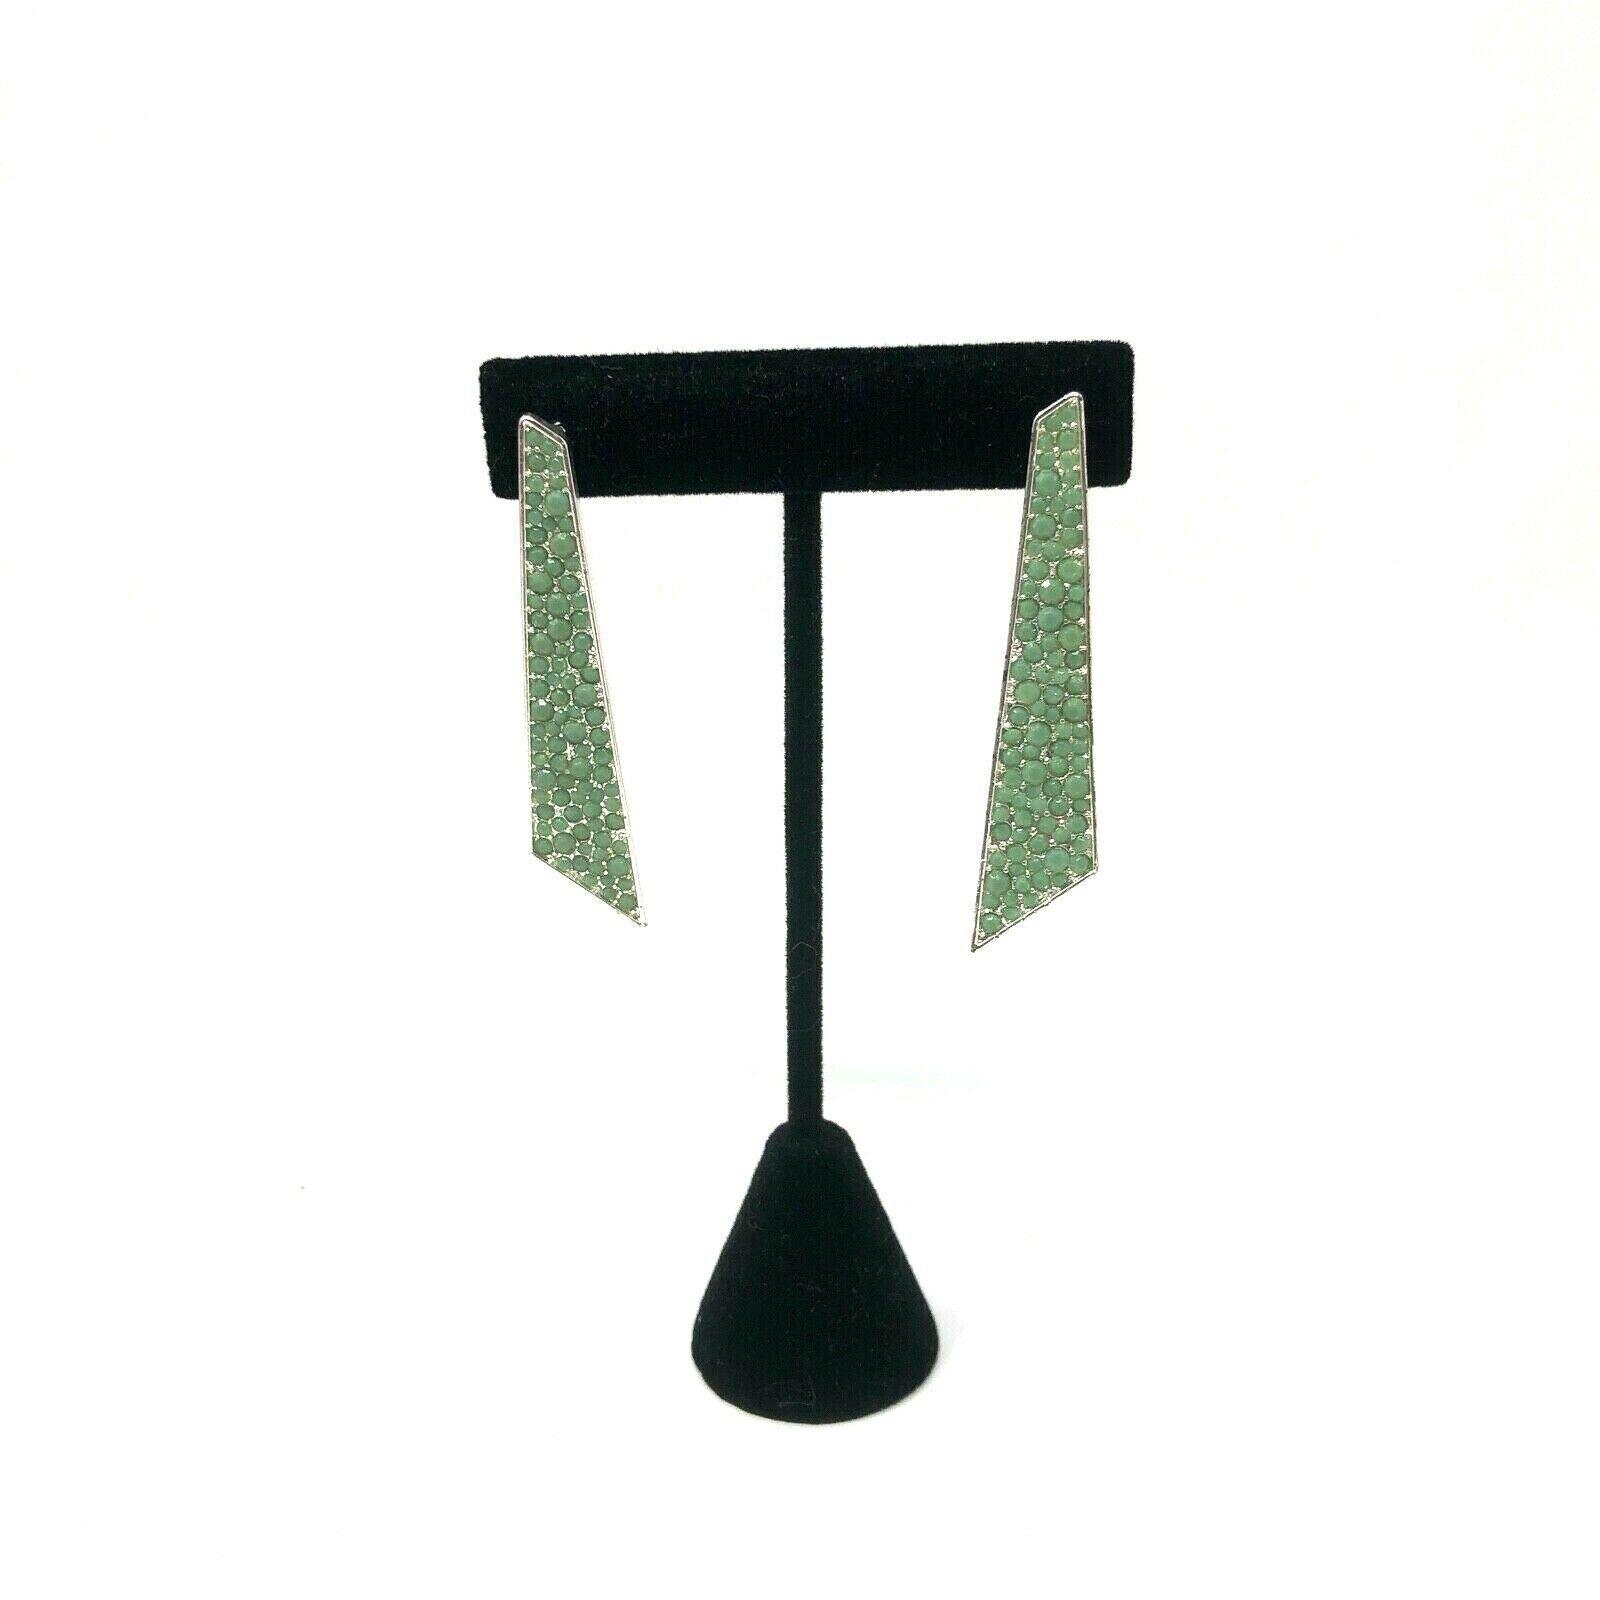 Avon Mark Earrings Green Angle Dangle Earrings Pierced Push Post Back - $11.87